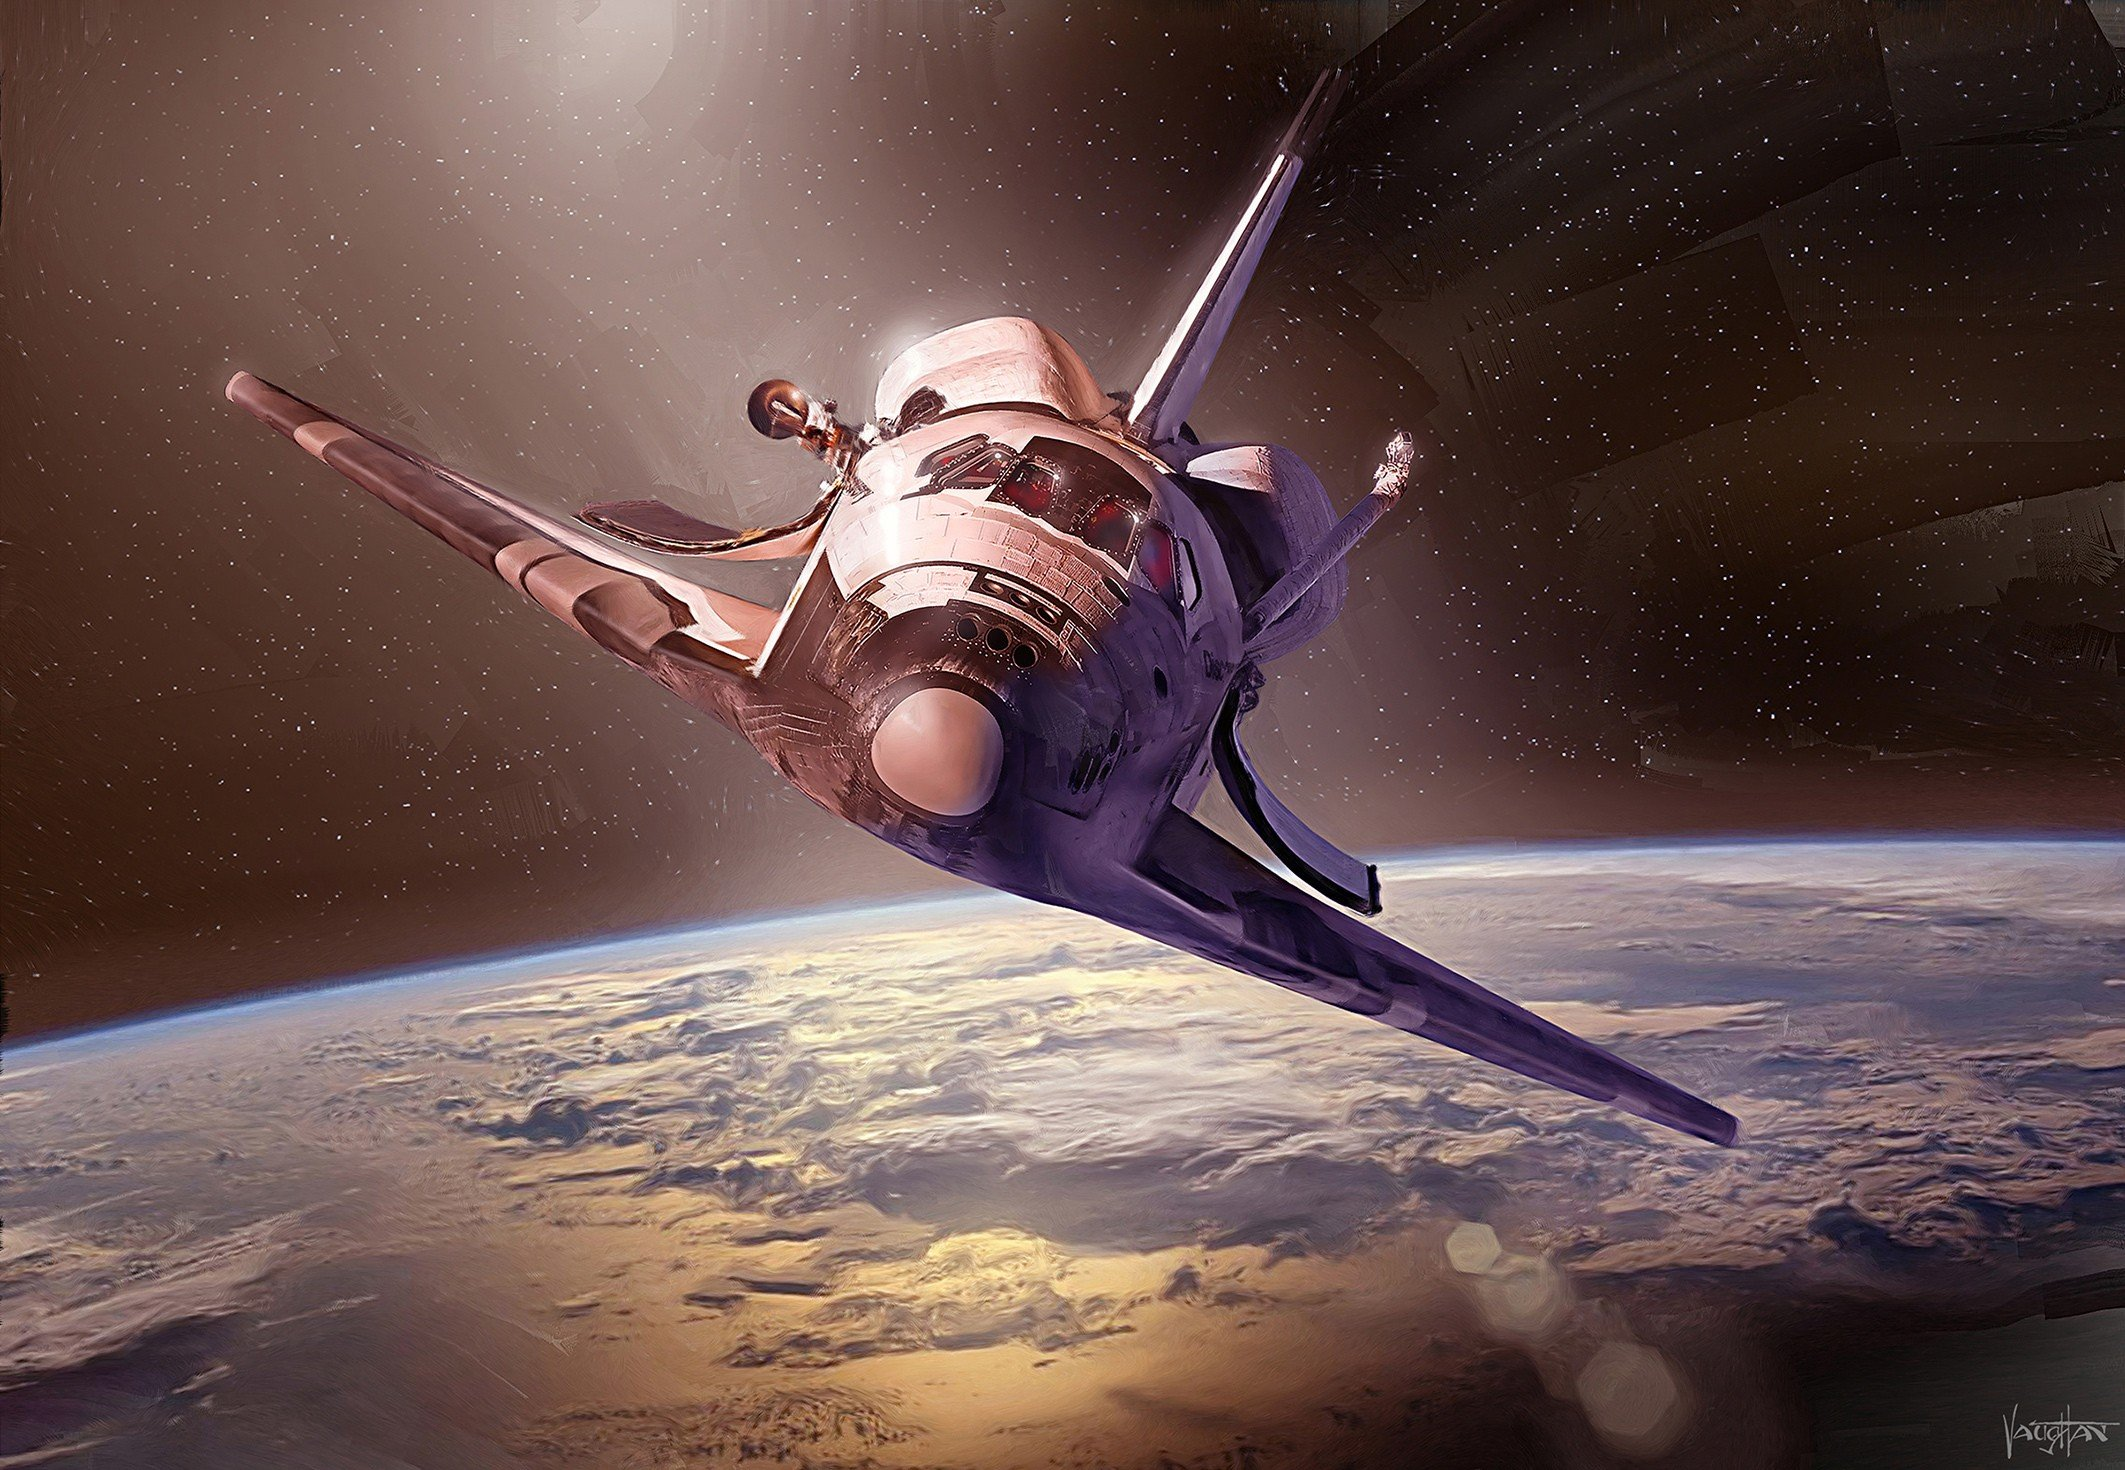 artwork, Space shuttle, Space, Digital art, Space art Wallpaper